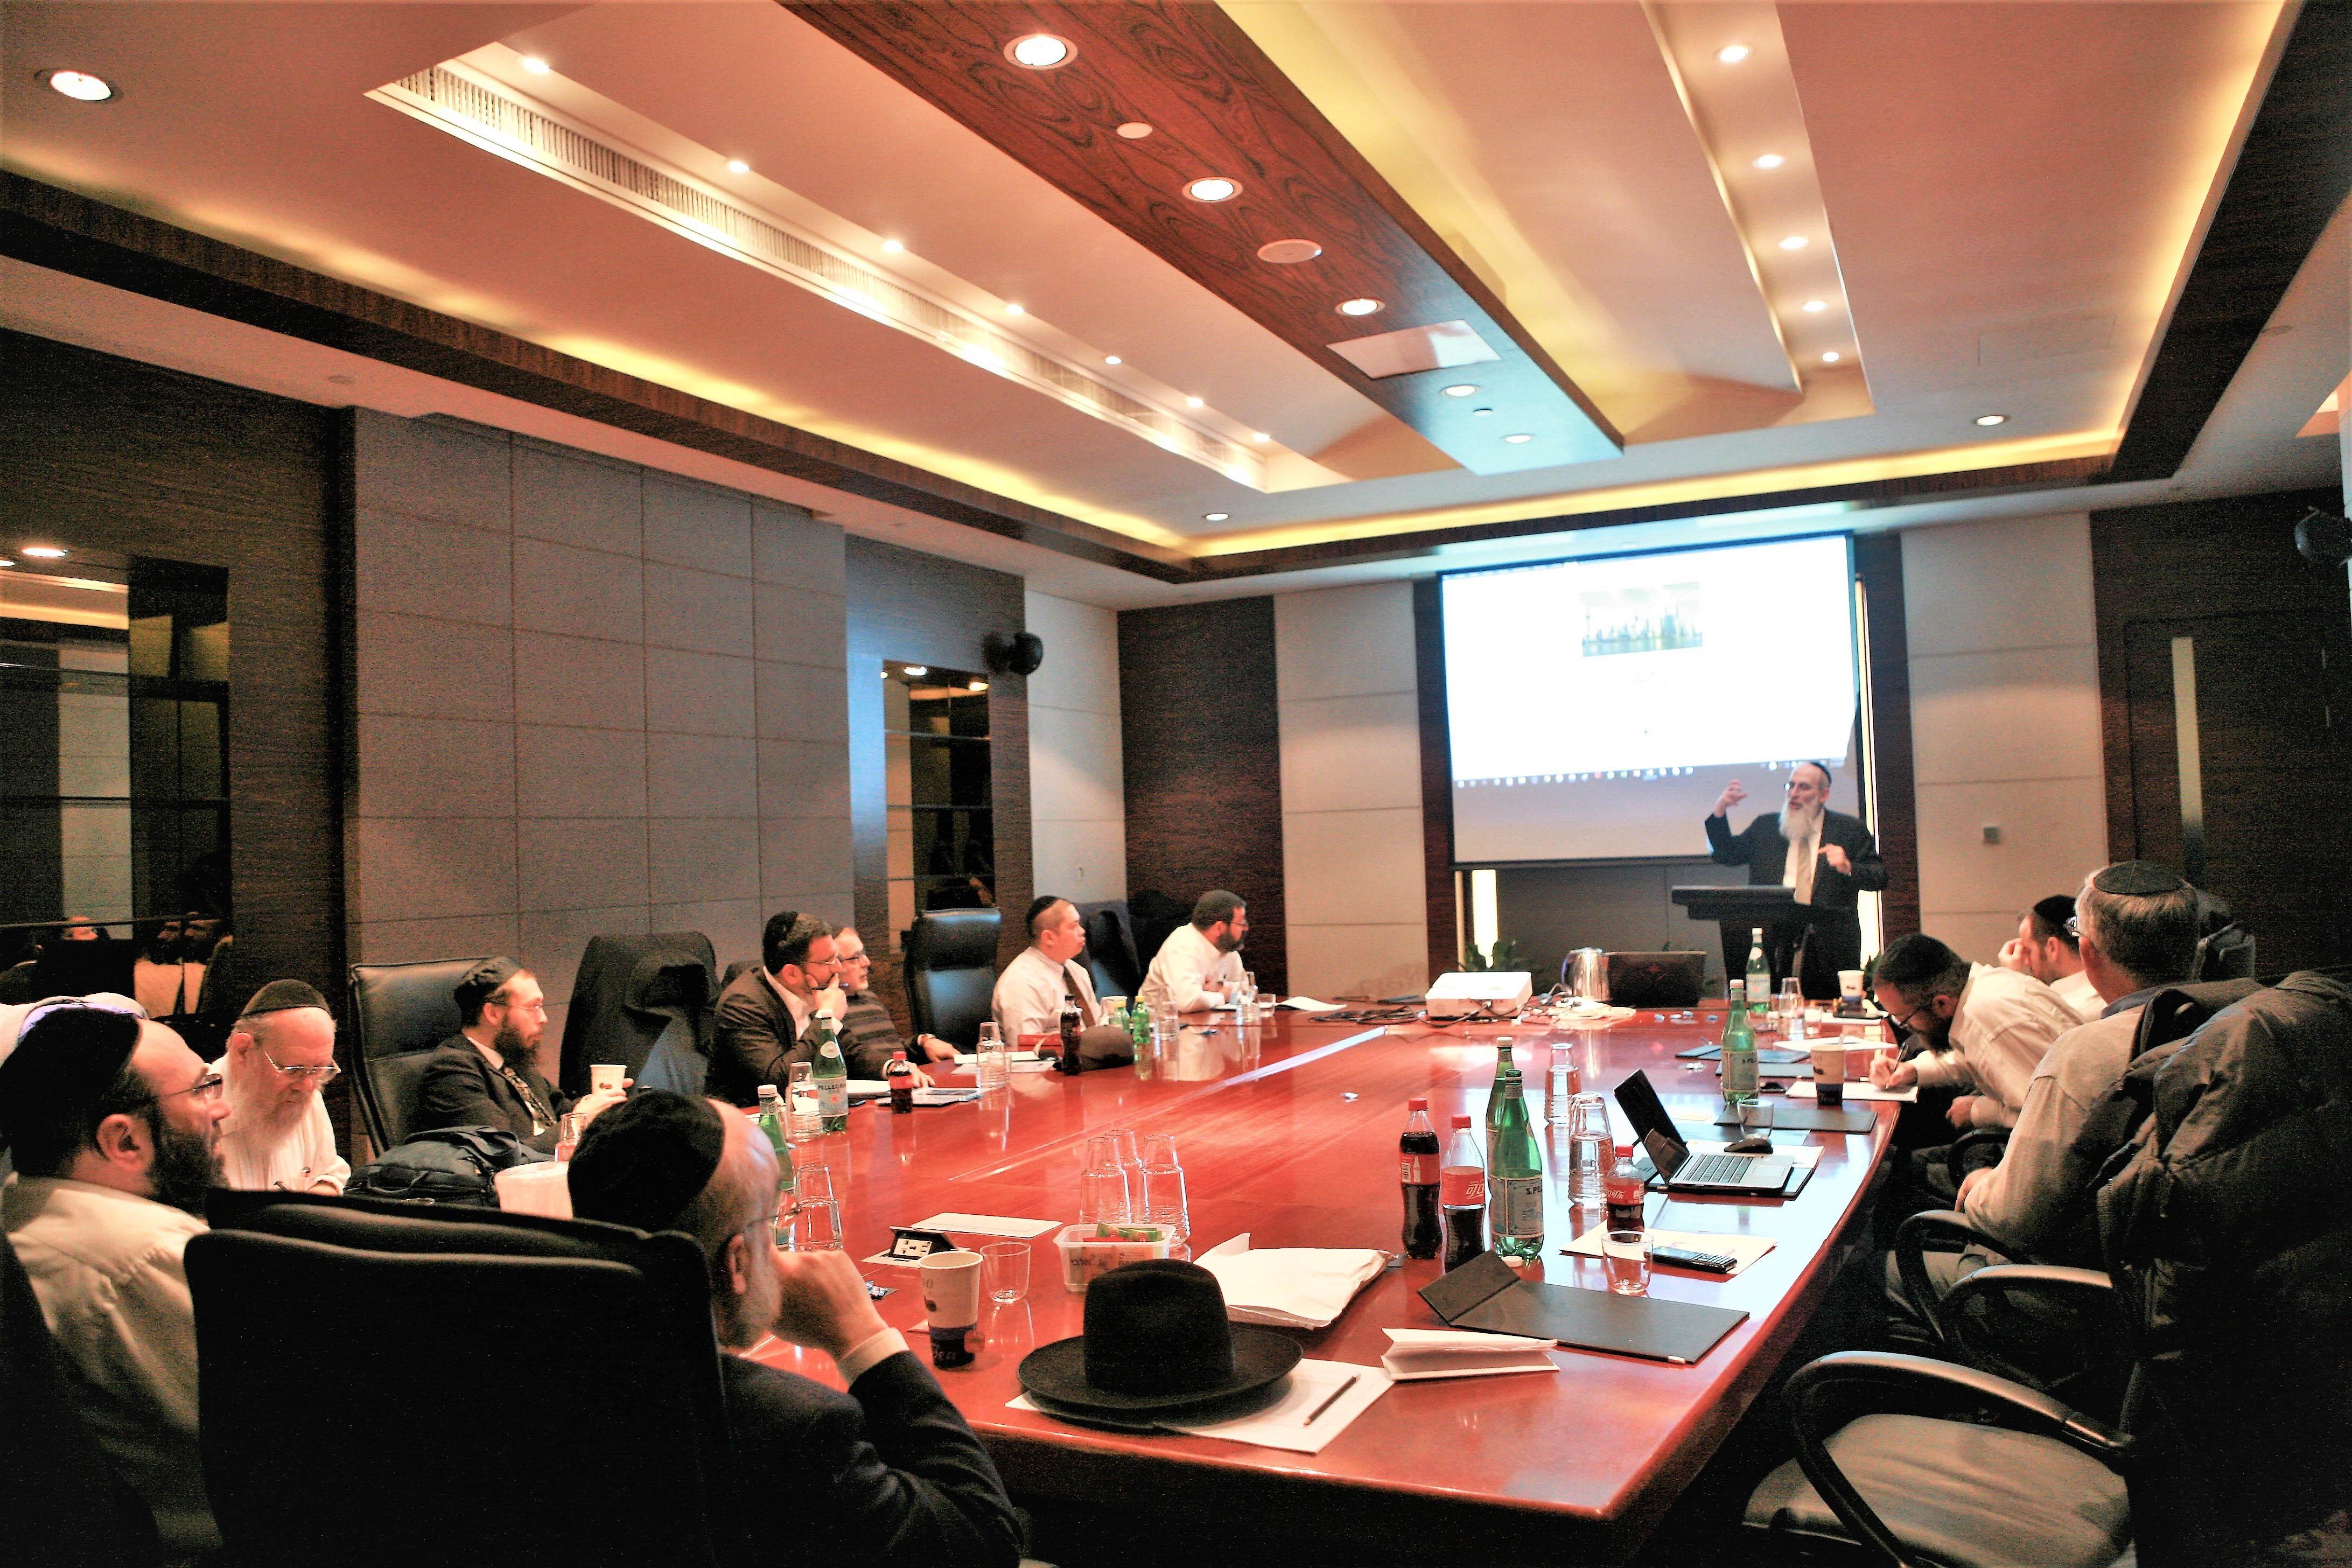 Pan-Asia Kosher Training Seminar Convened by STAR-K in Shanghai